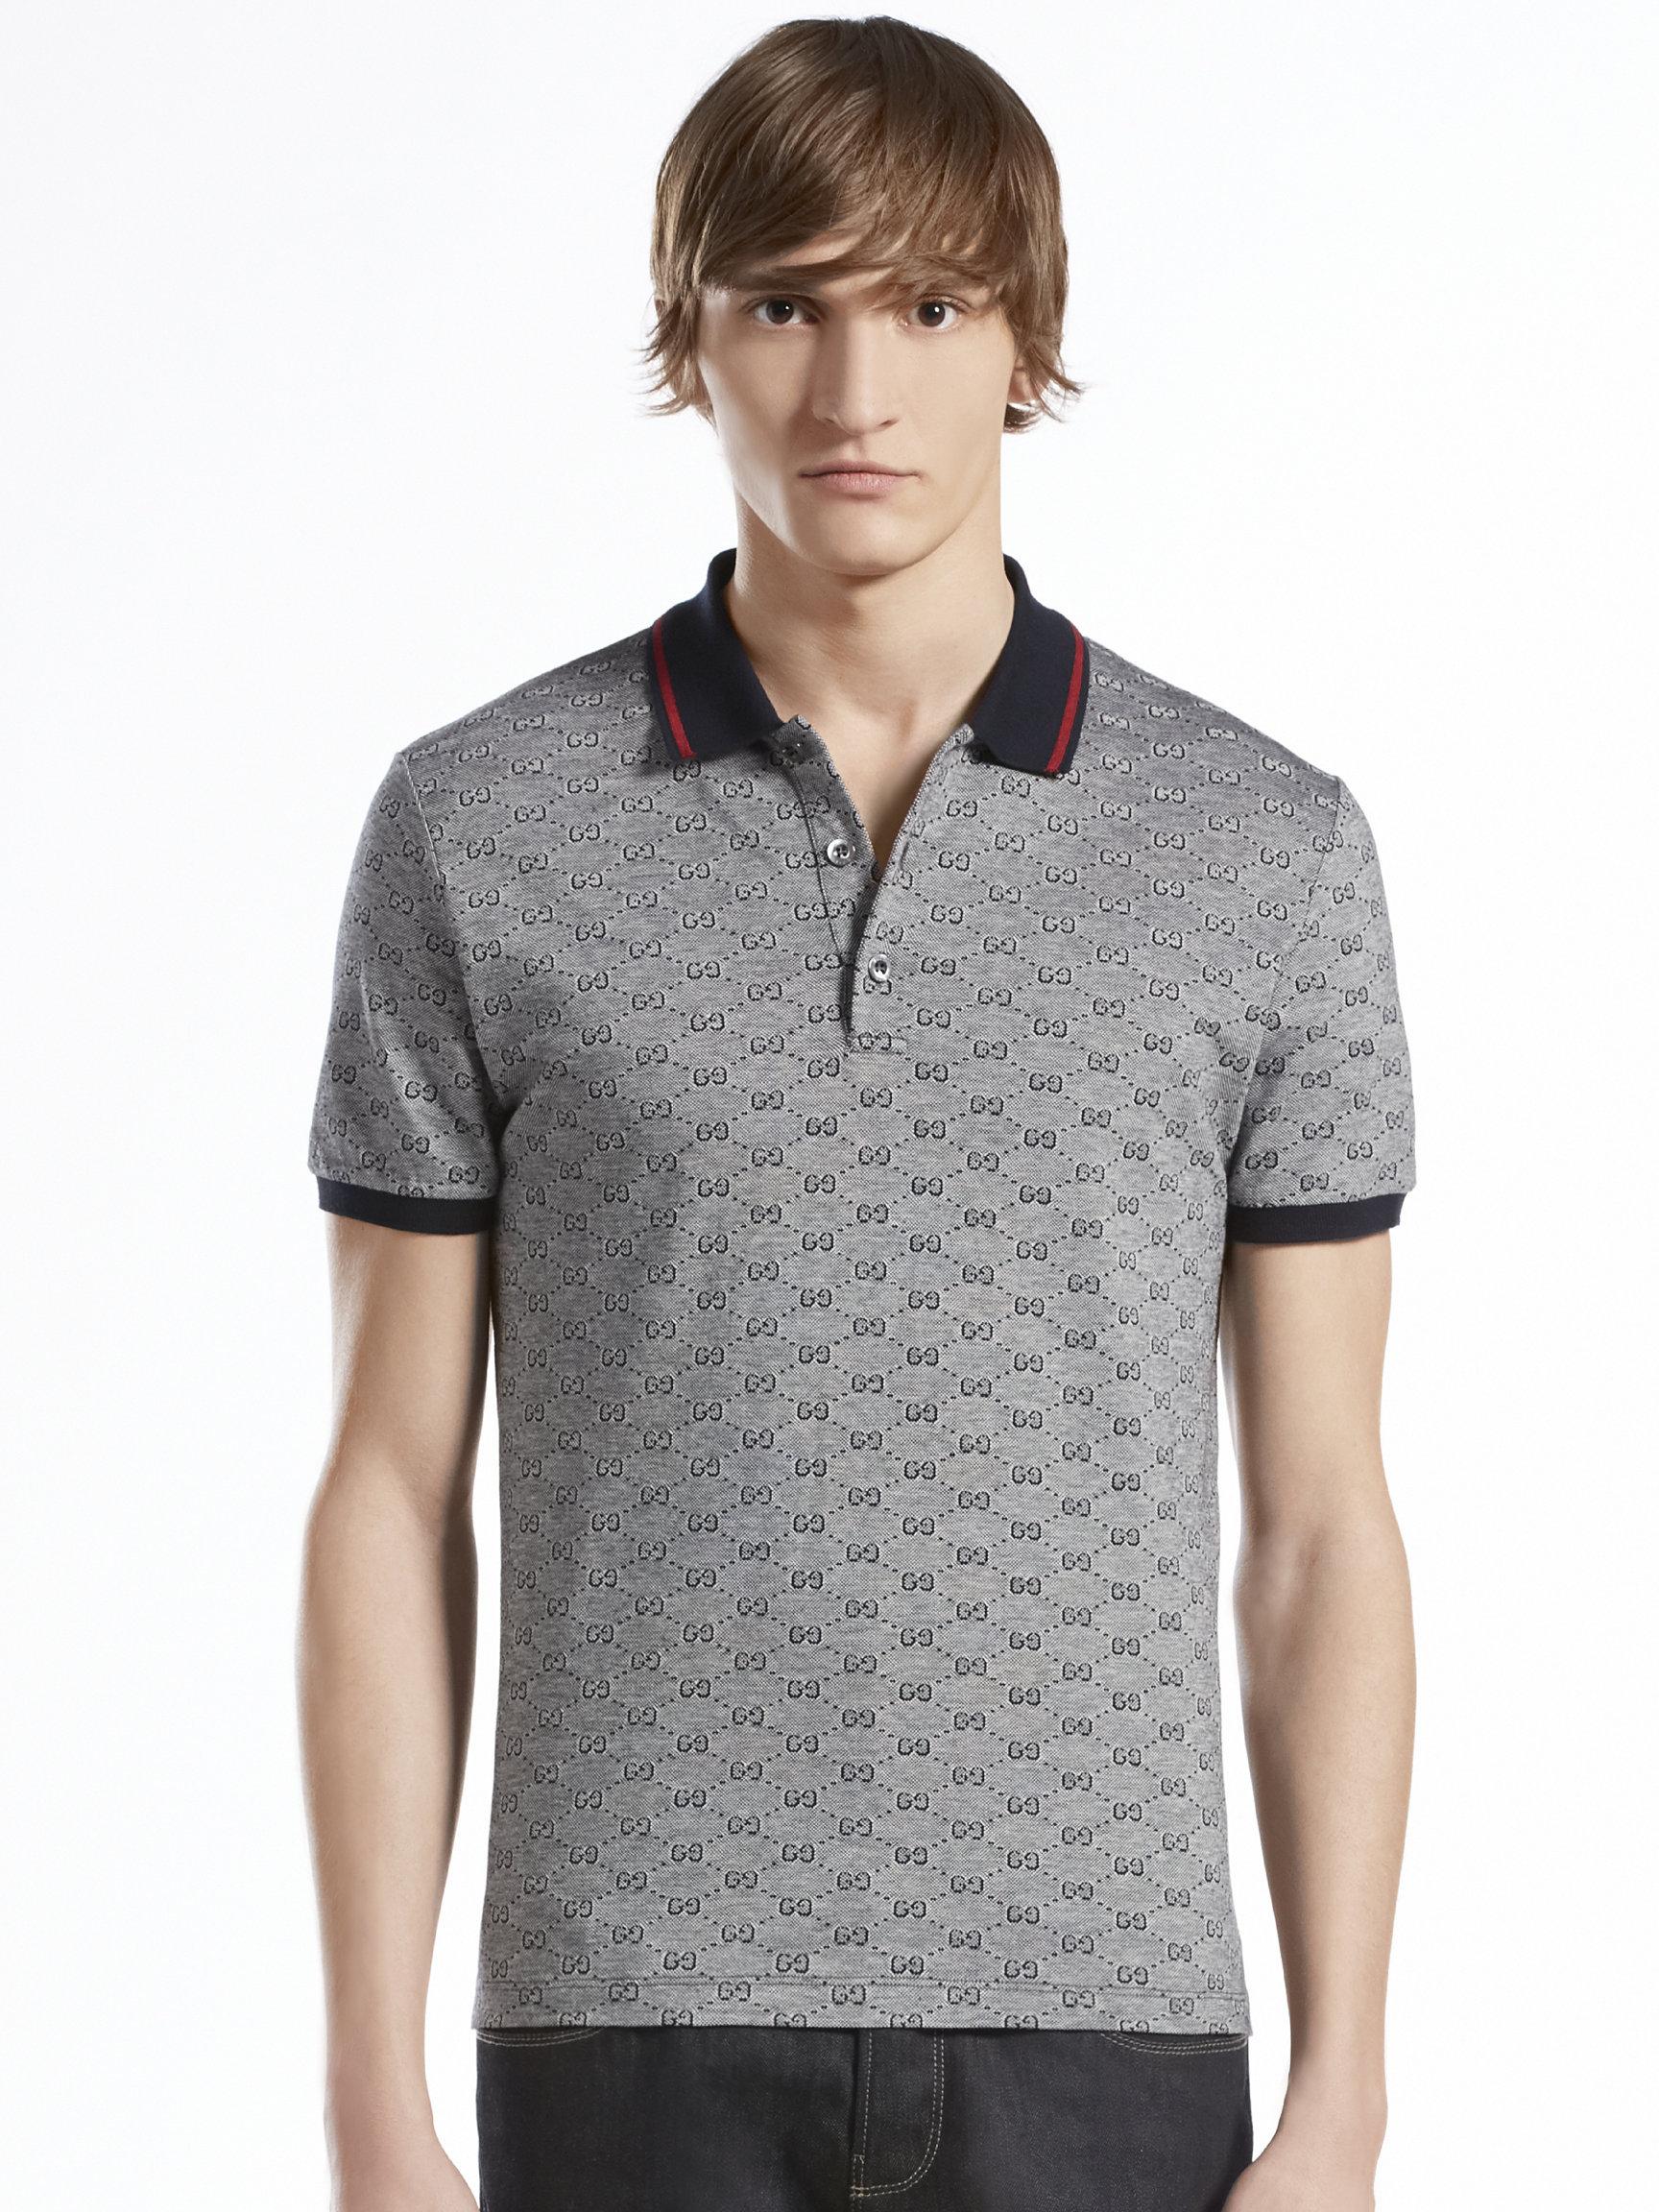 81dba01b5 Mens Gucci Polo Shirt Sale